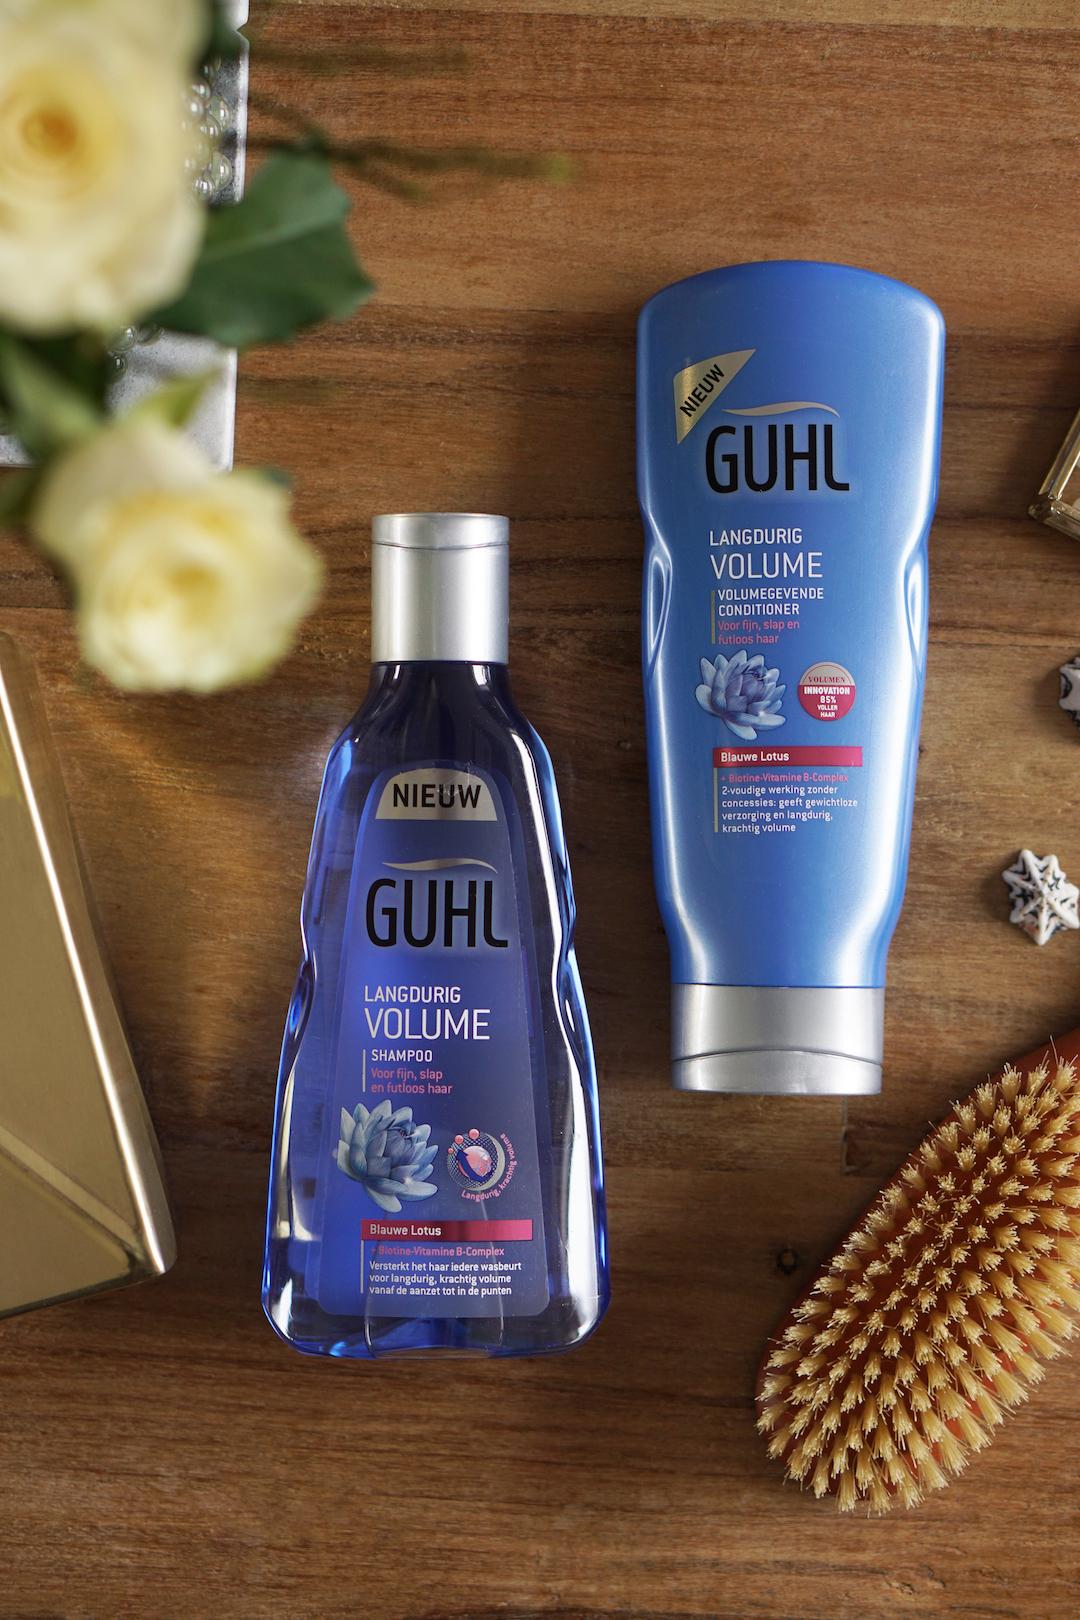 GUHL Langdurig Volume & Verzorging